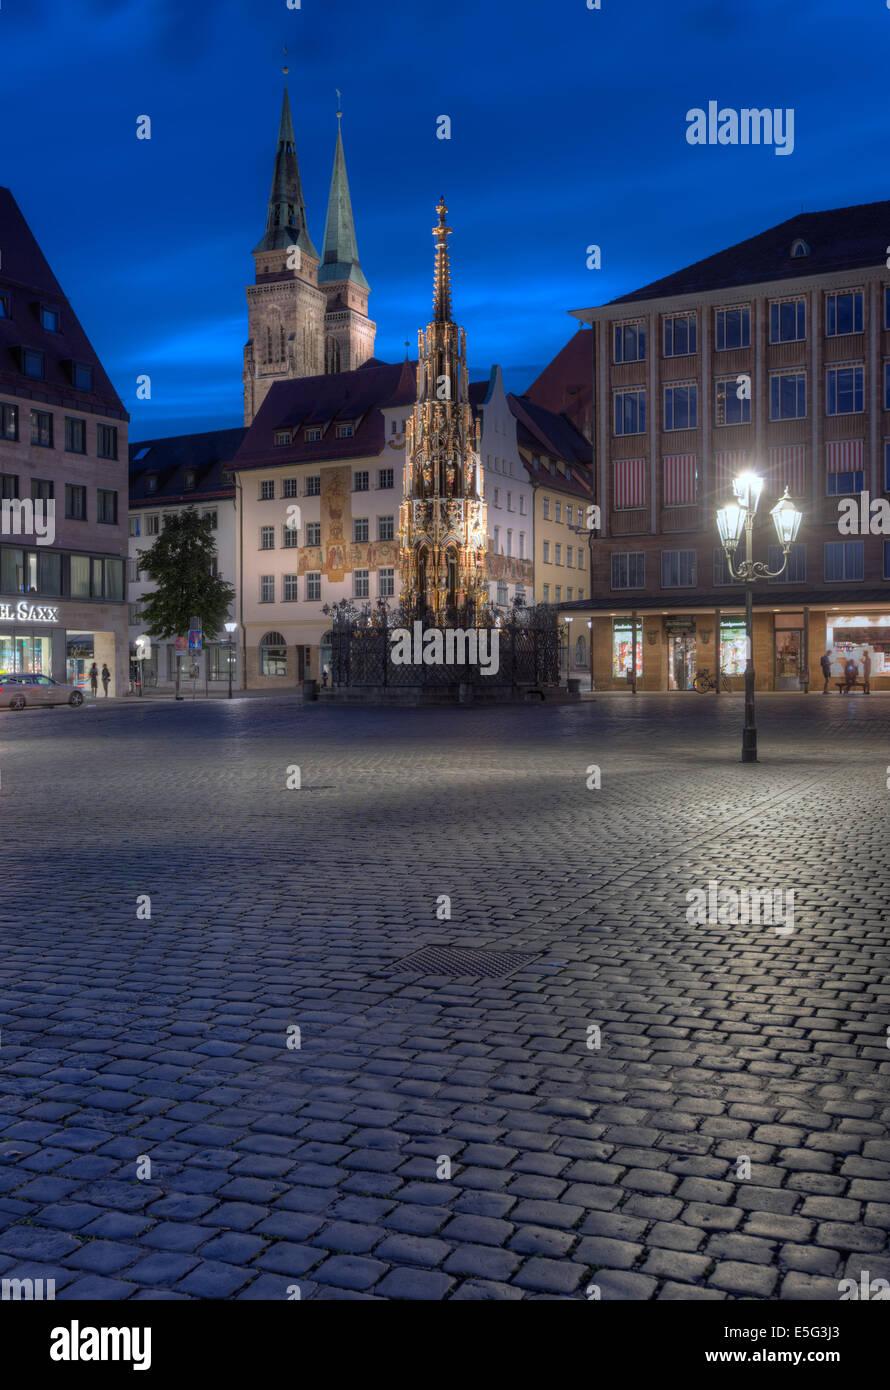 Die Schöner Brunnen in der Nürnberger Hauptmarkt. Stockbild